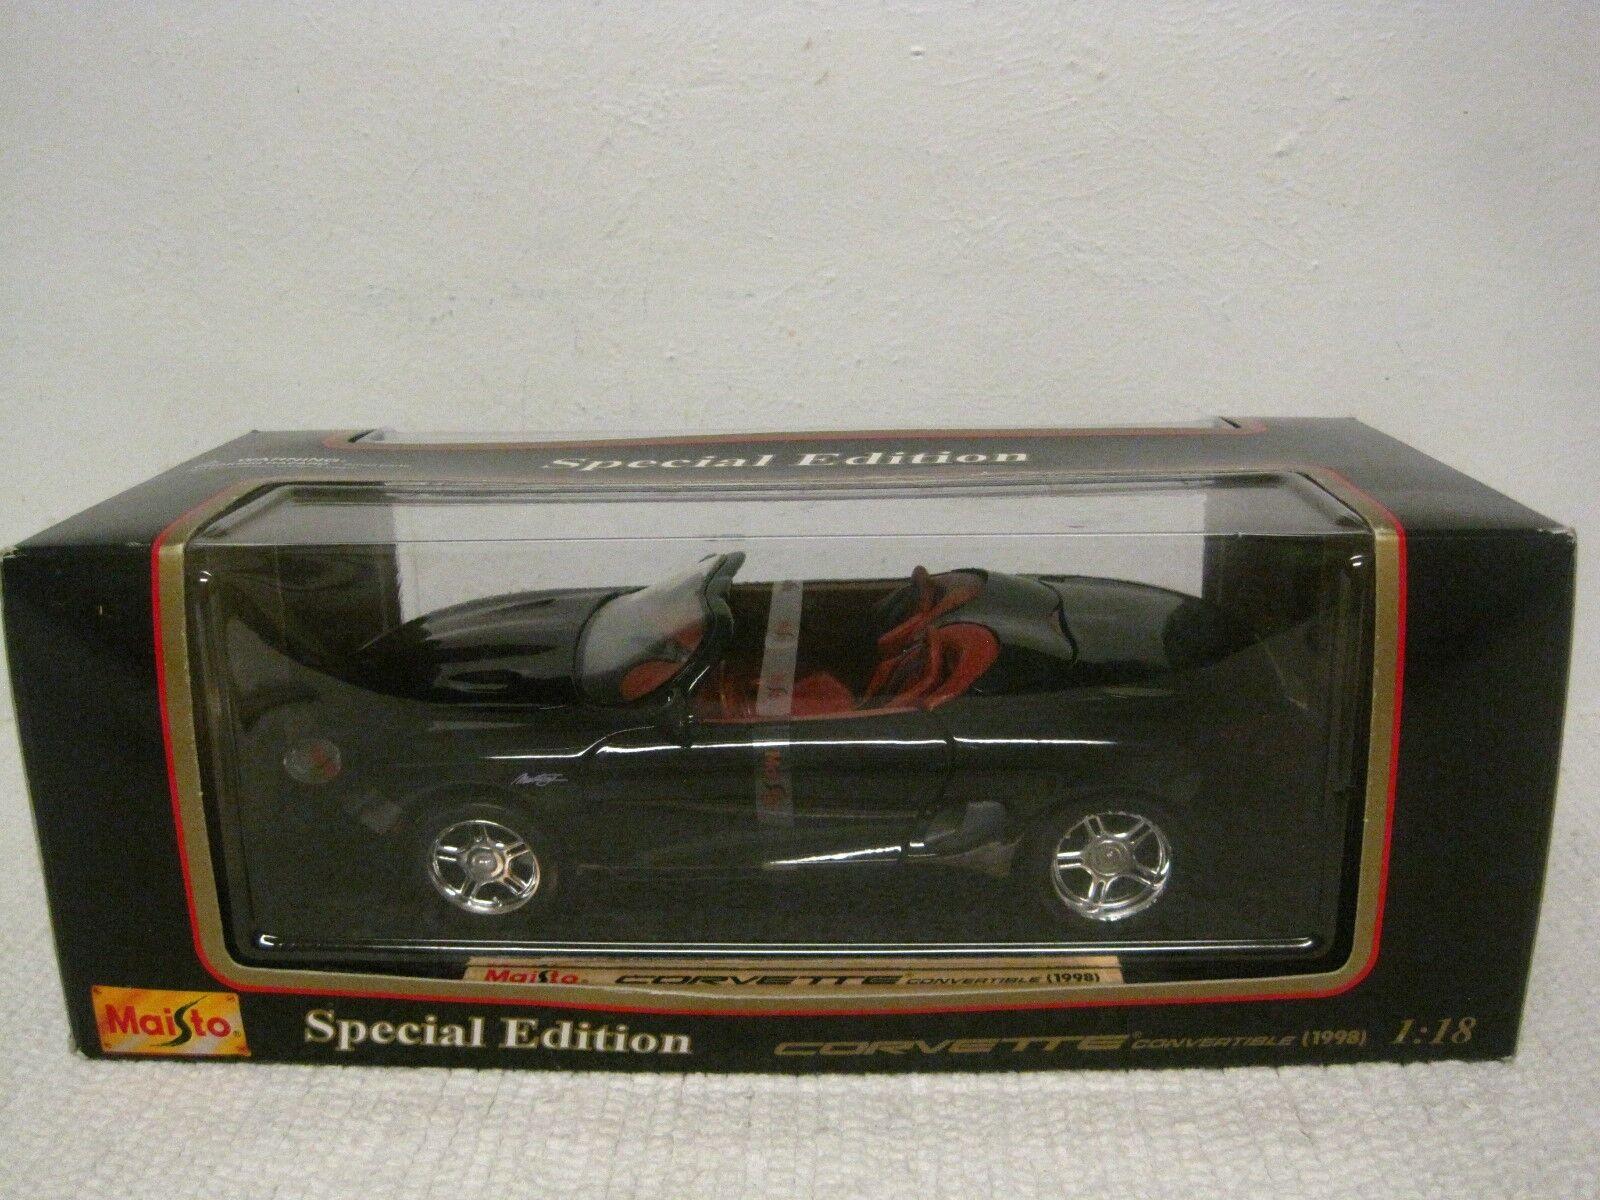 Error coche Maisto Special Edition Negro con Interior Rojo Mustang en Caja Corvette 98